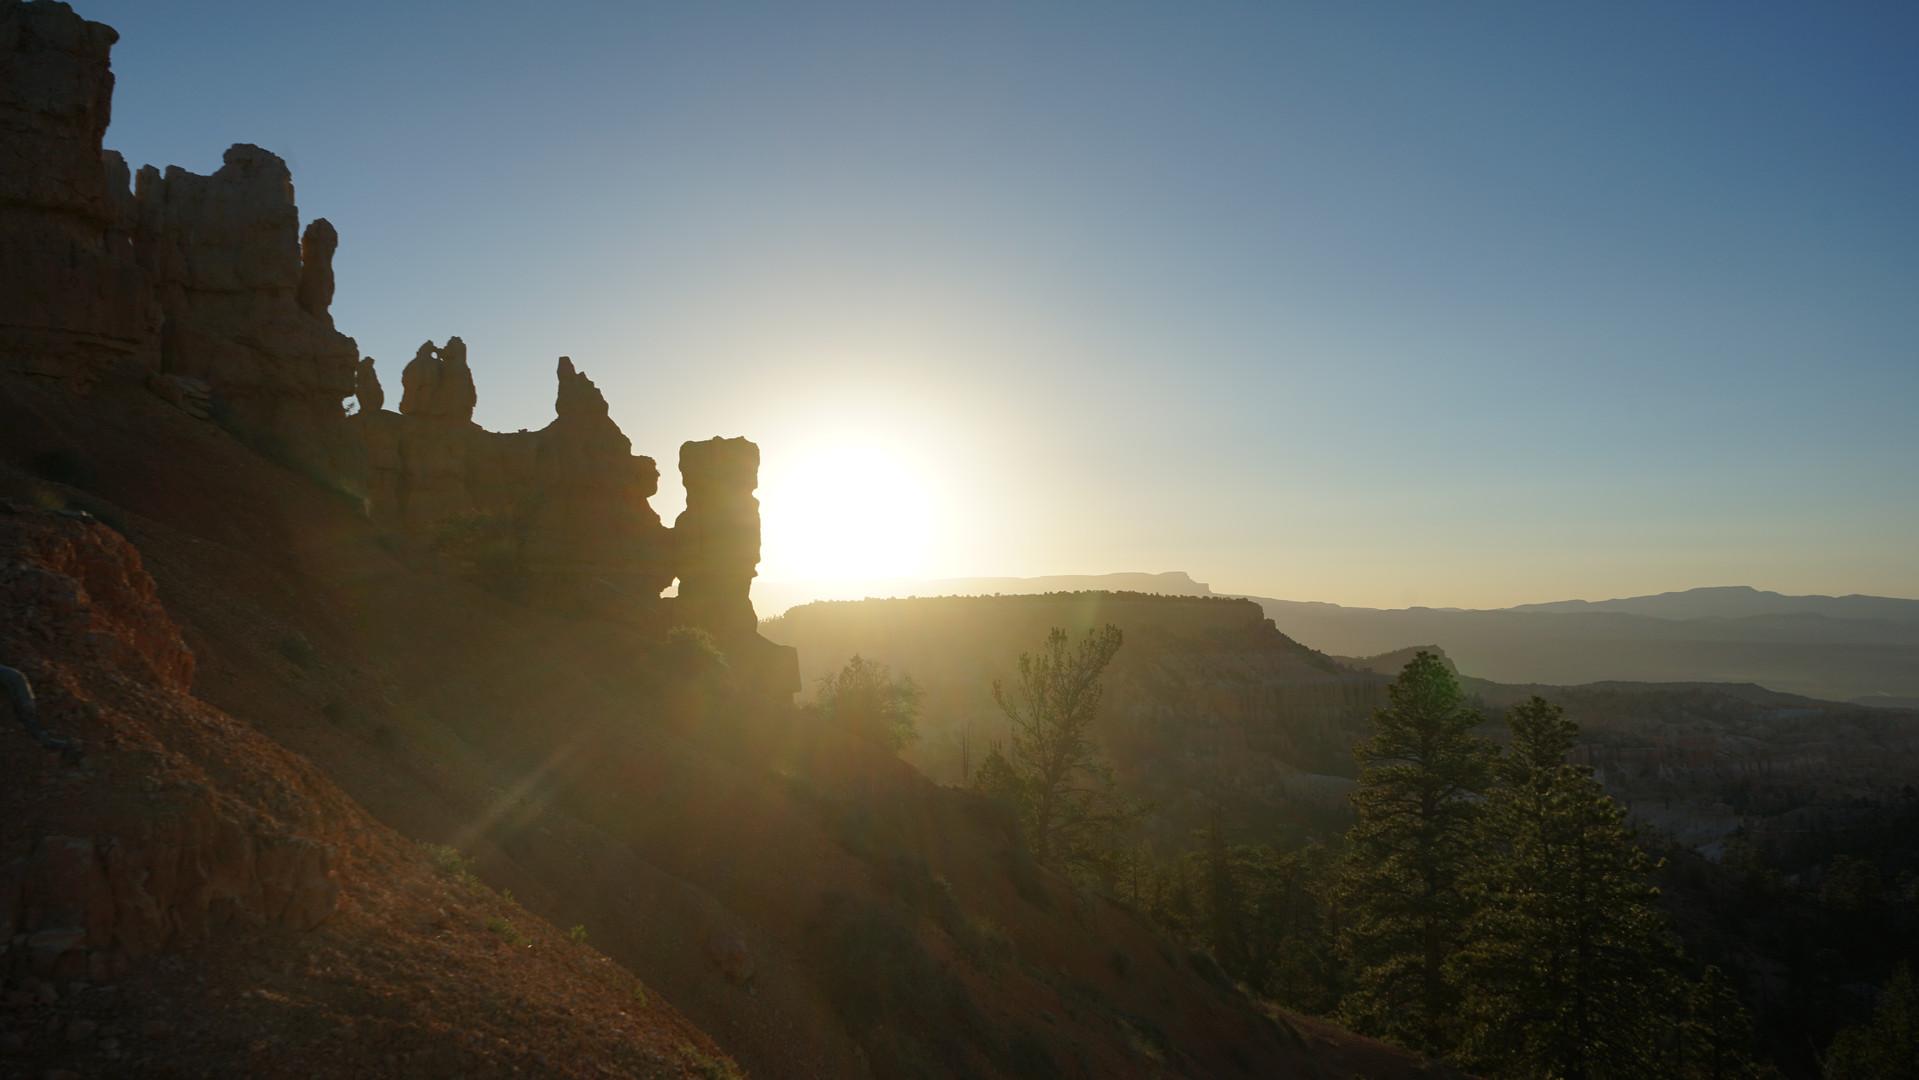 Bryce Canyon, UT 9